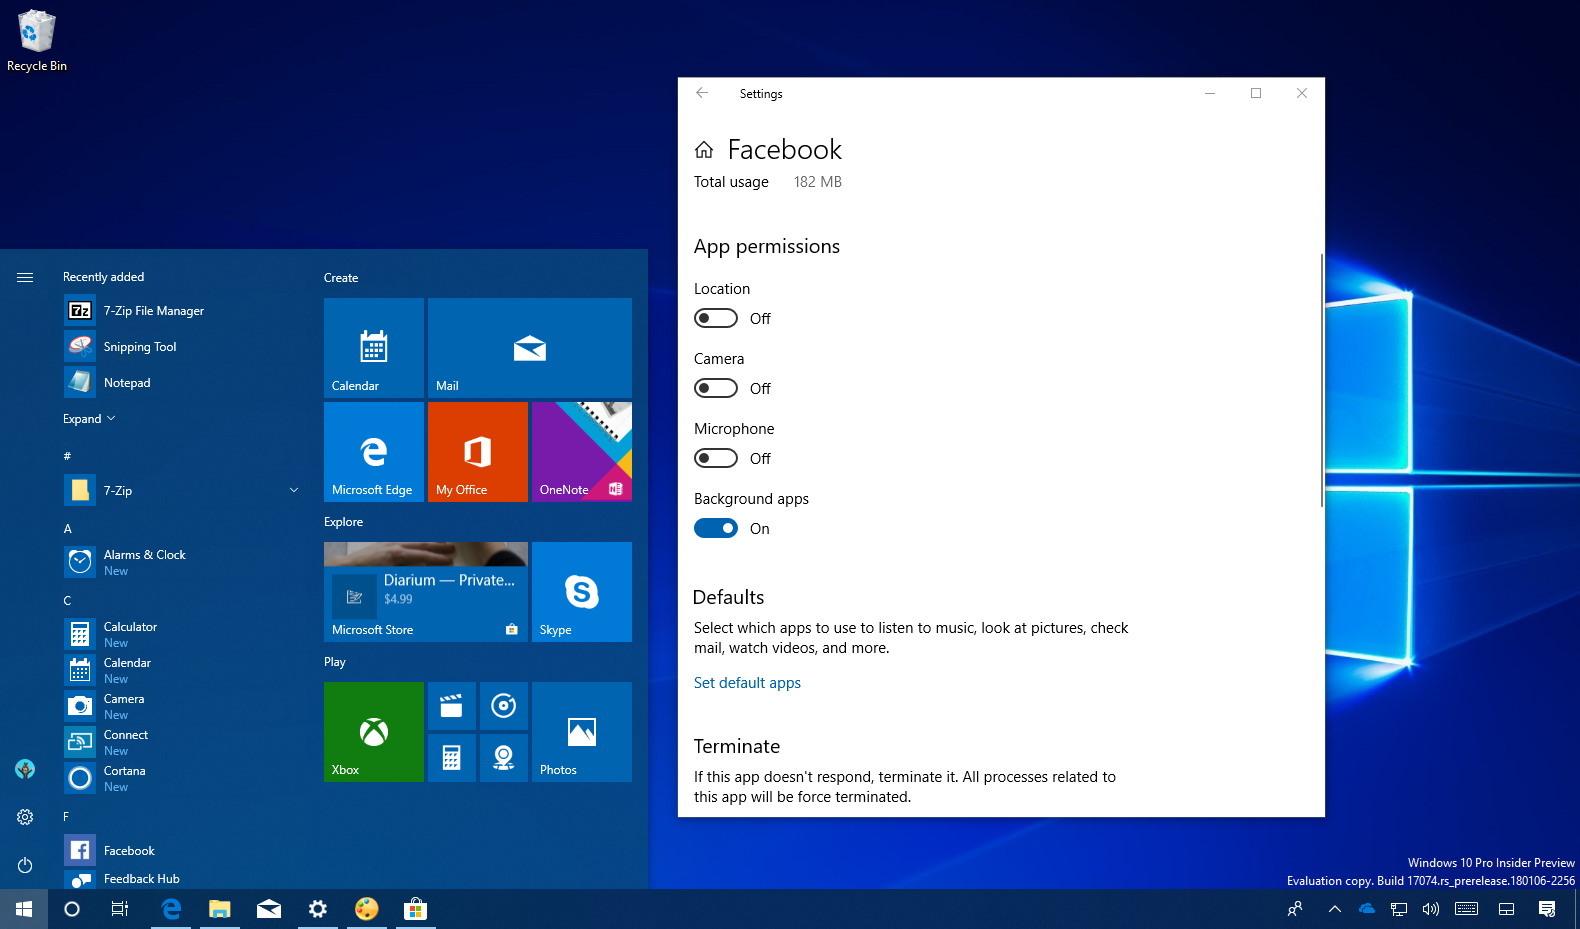 App permissions on Windows 10